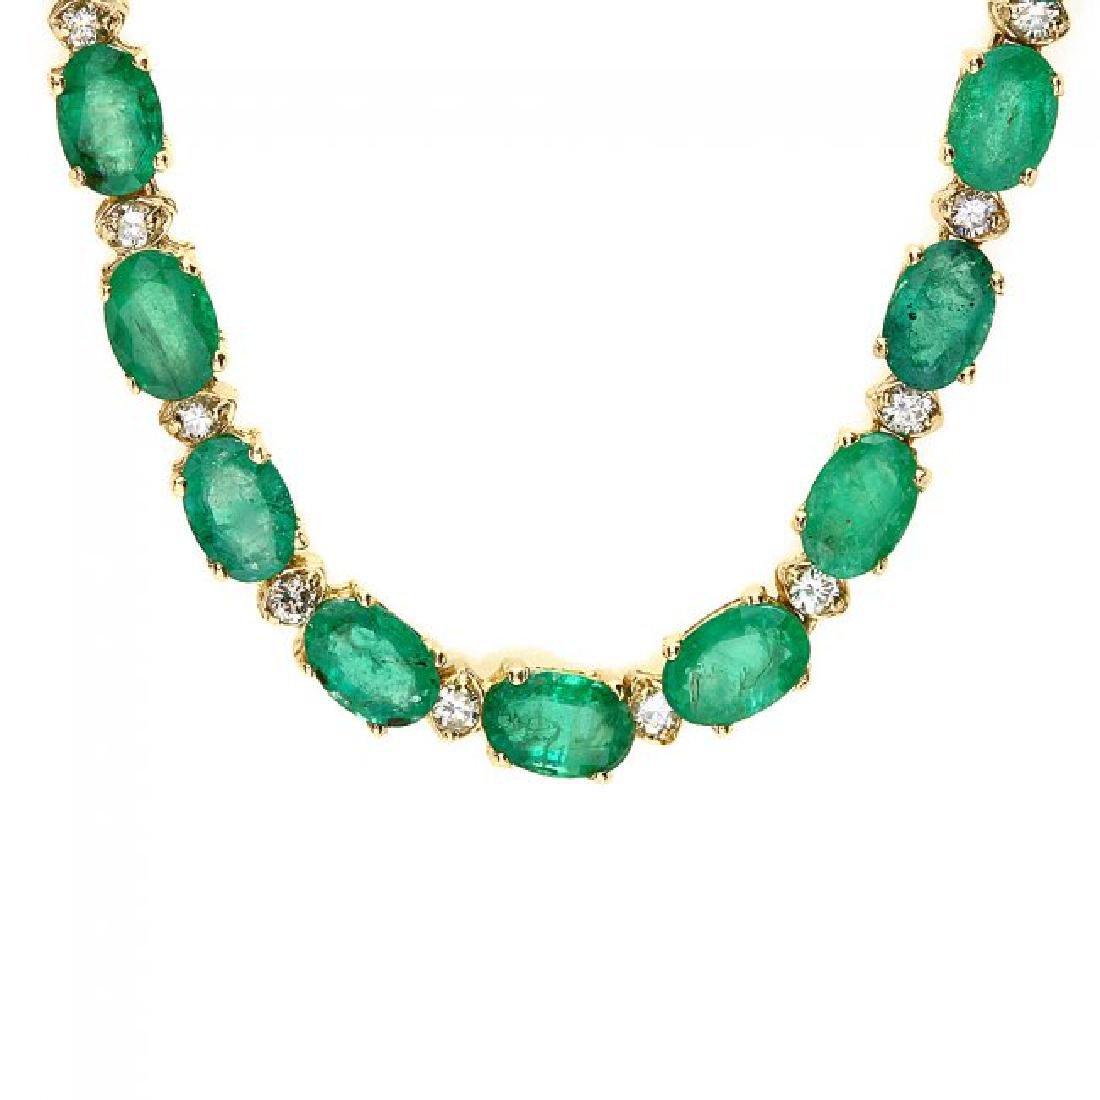 14k Gold 23ct Emerald 1.55ct Diamond Necklace - 2